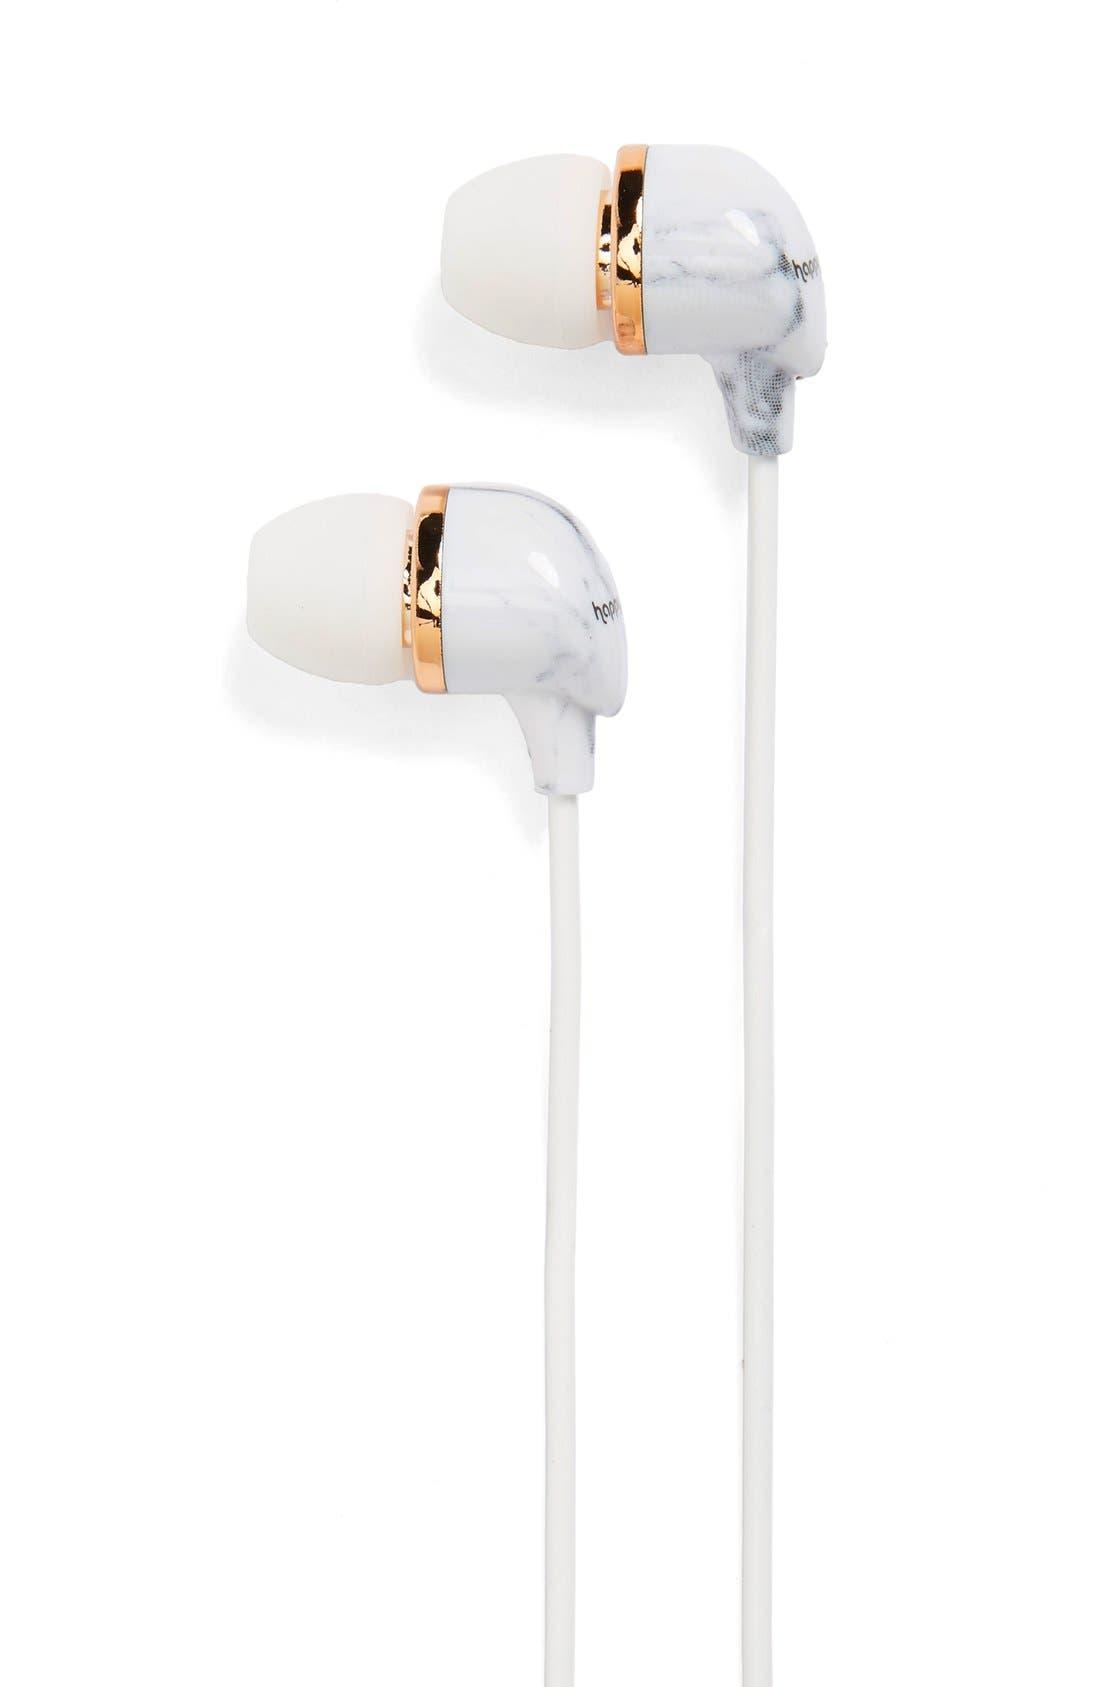 Main Image - Happy Plugs In-Ear Headphones